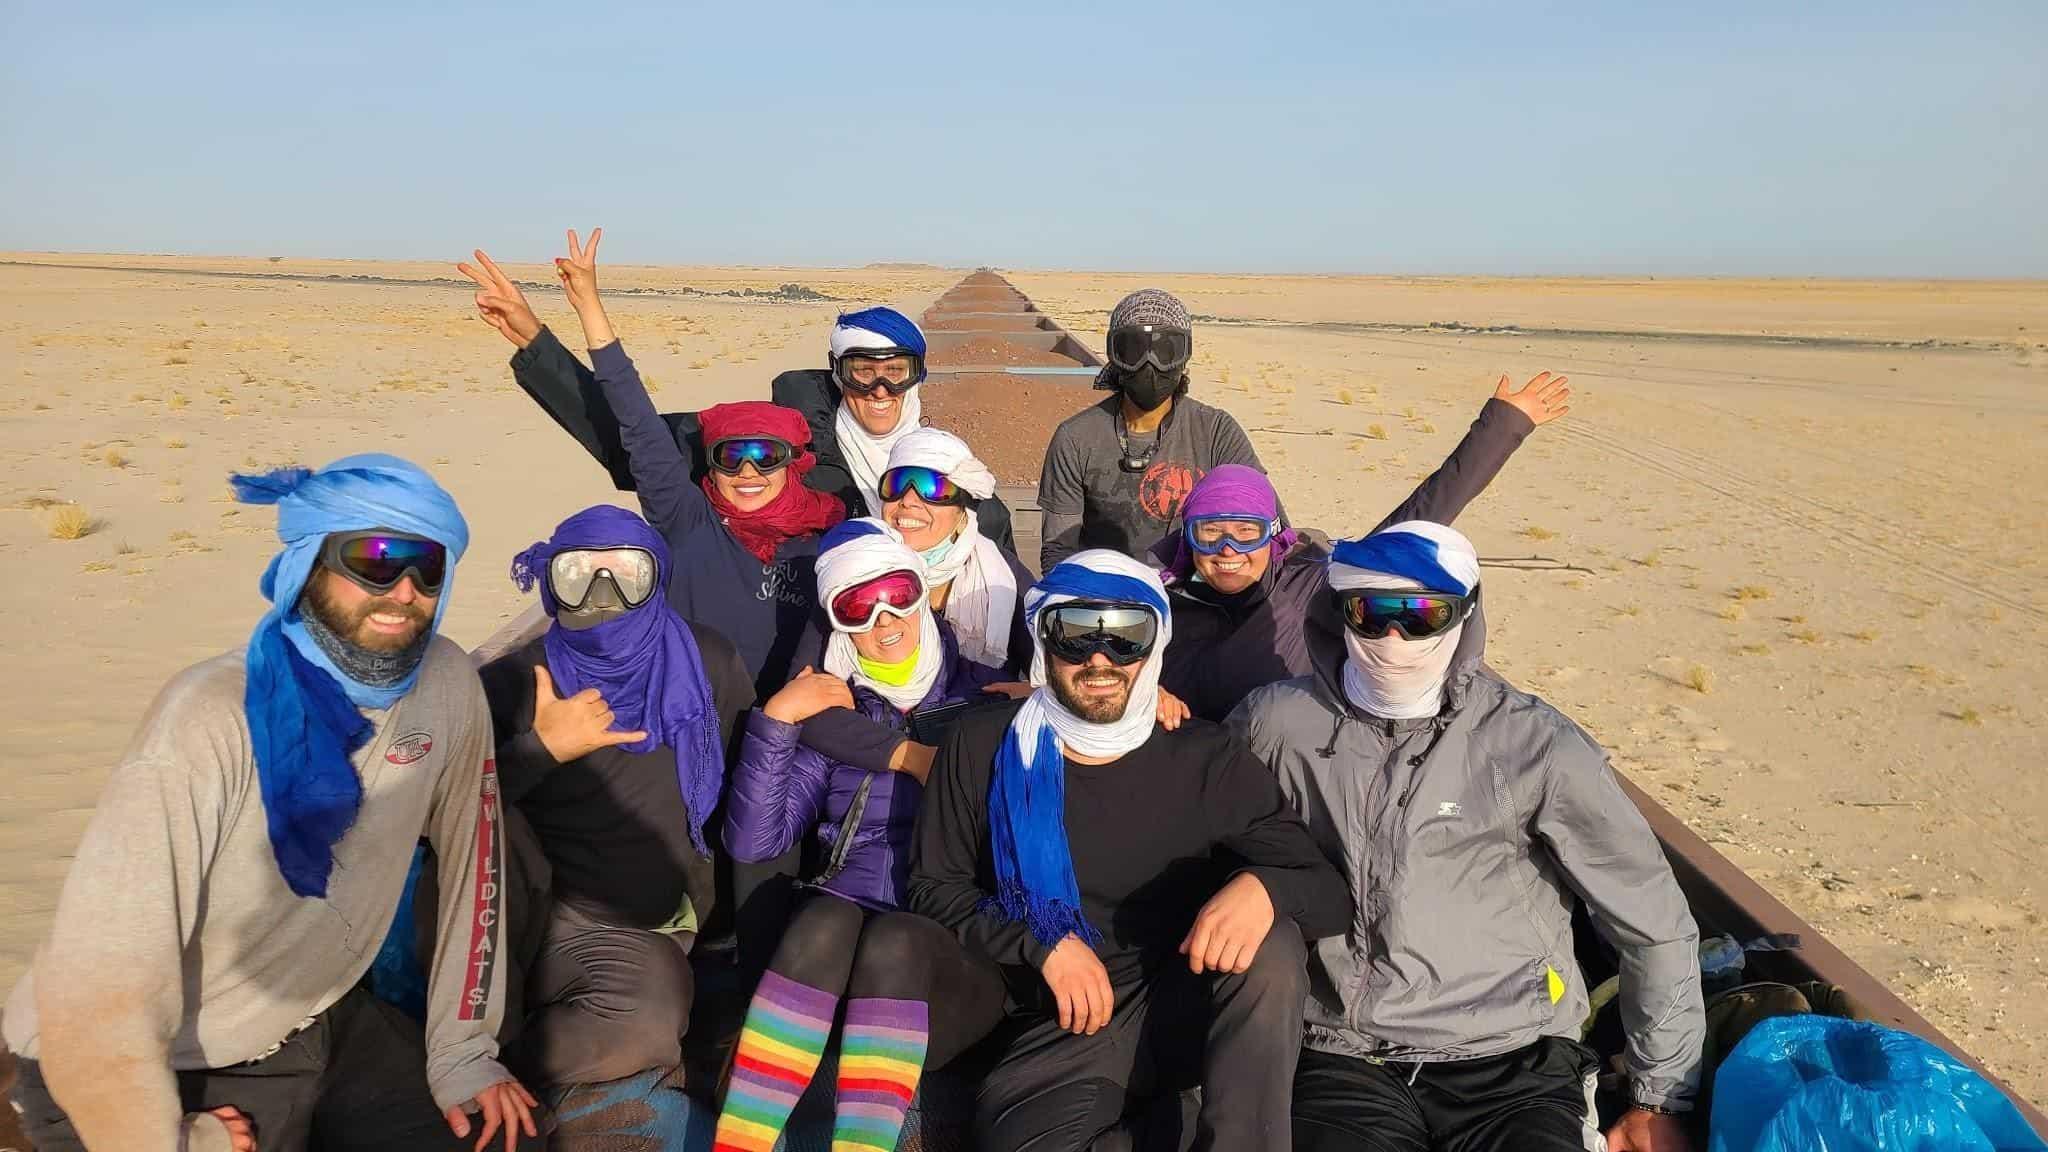 A group of adventurers rides the iron ore train from Choum to Nouadhibou, Mauritania.